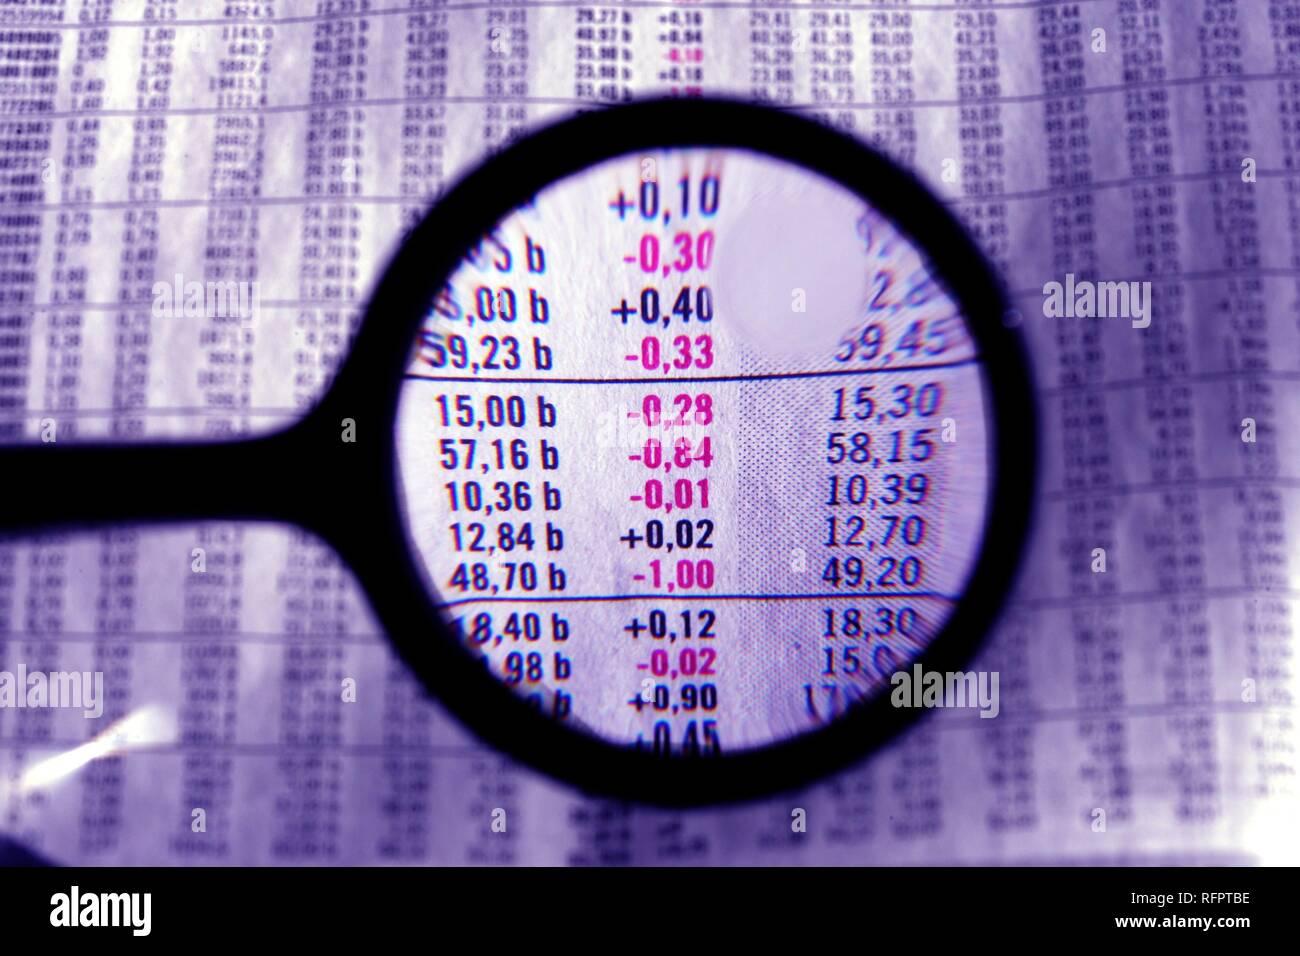 DEU, Germany : Symbolic photo economy Stock Photo